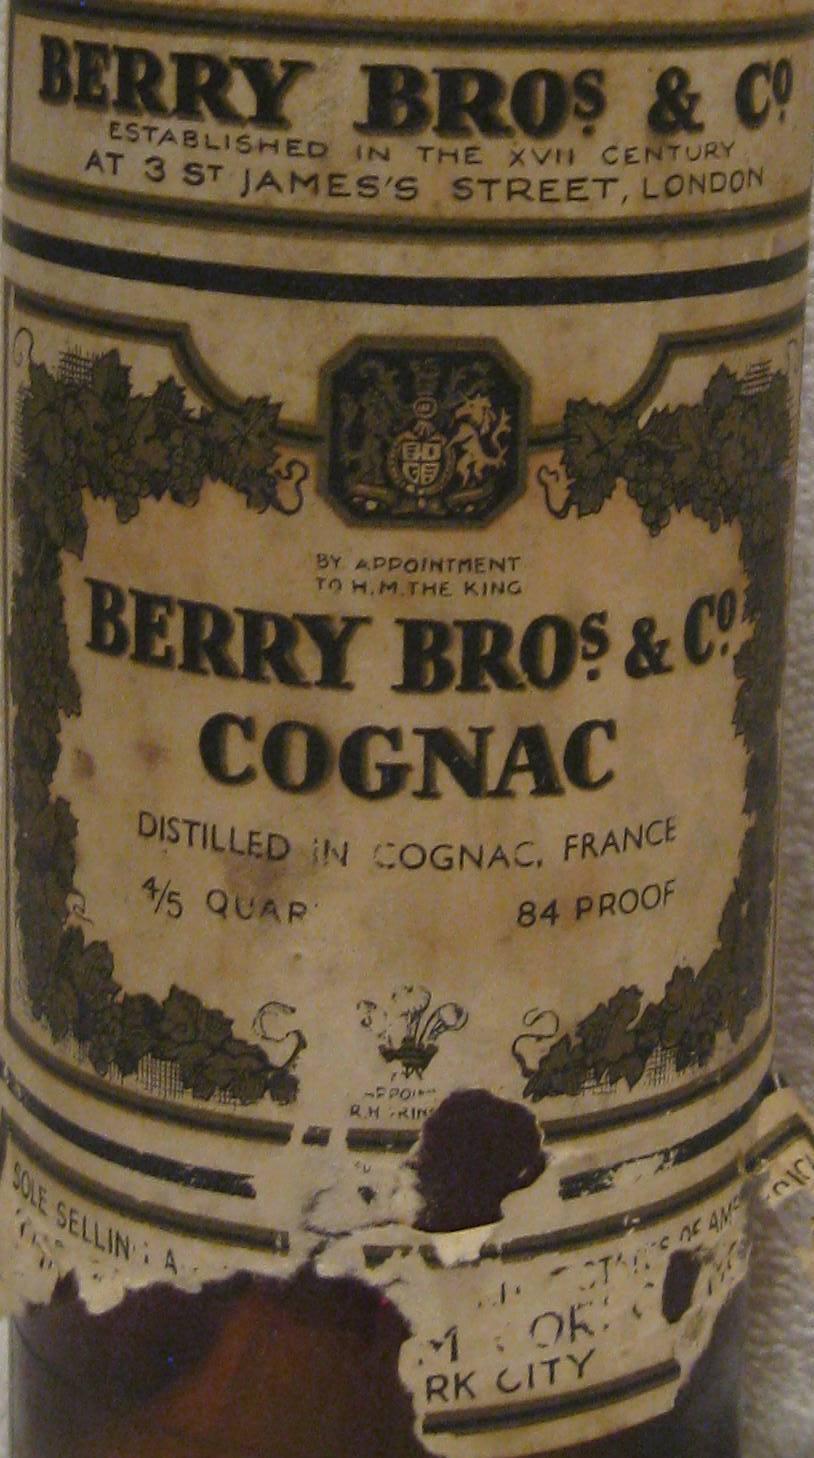 Berry Bros & Co Cognac 84 Proof Bottle